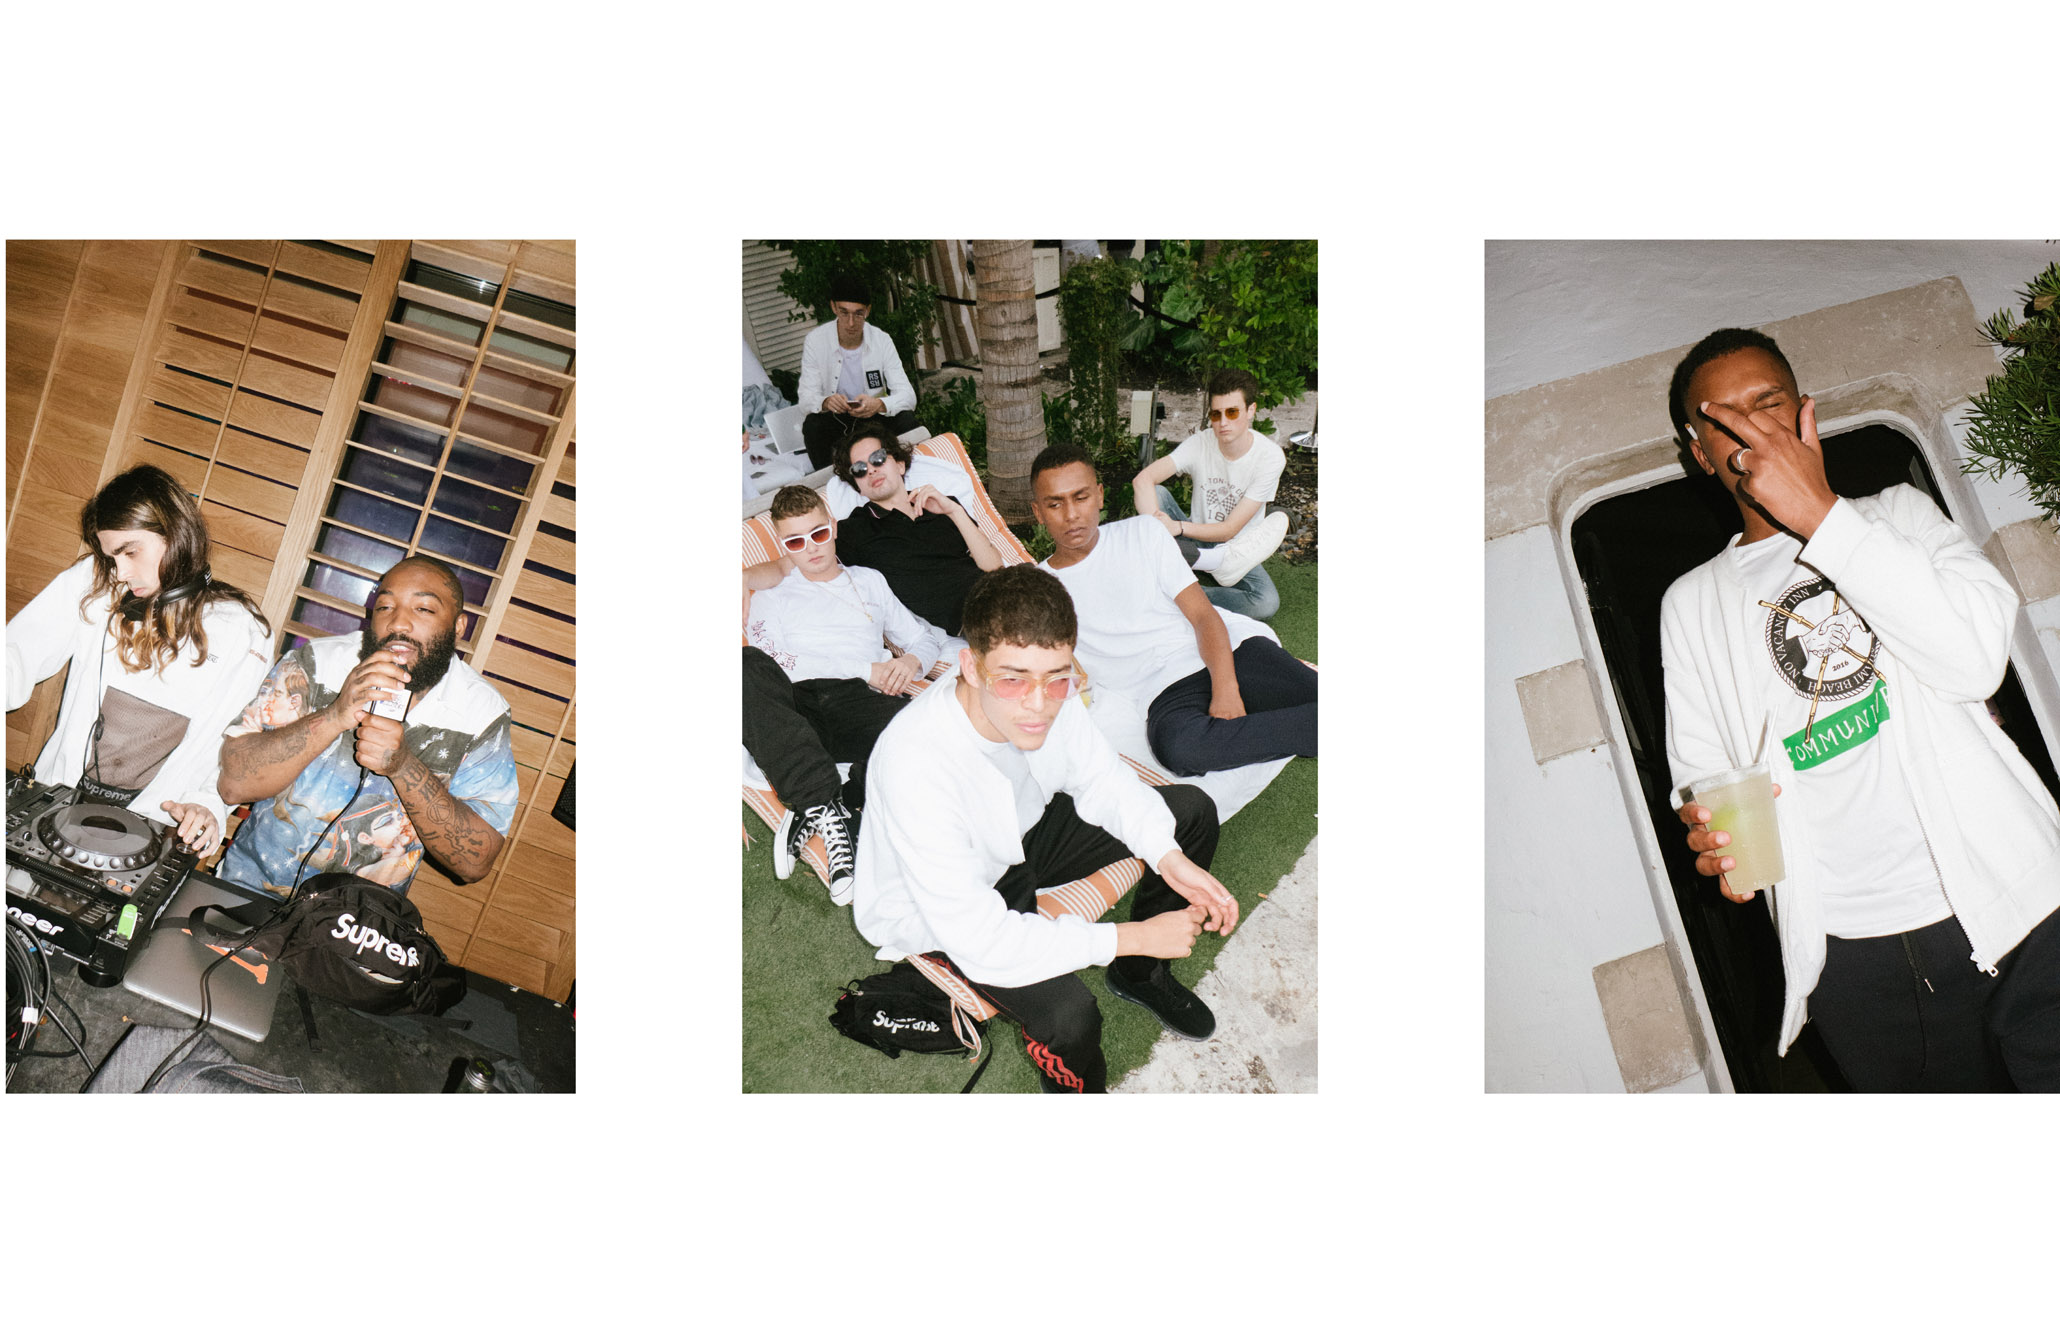 From left to right : Cyber69 with Asap Bari,Raff Law, Gianni Mora, Gleb Kostin, Jonah Levine, Joshua Hercules, Jordan Vickors,Joshua Hercules.